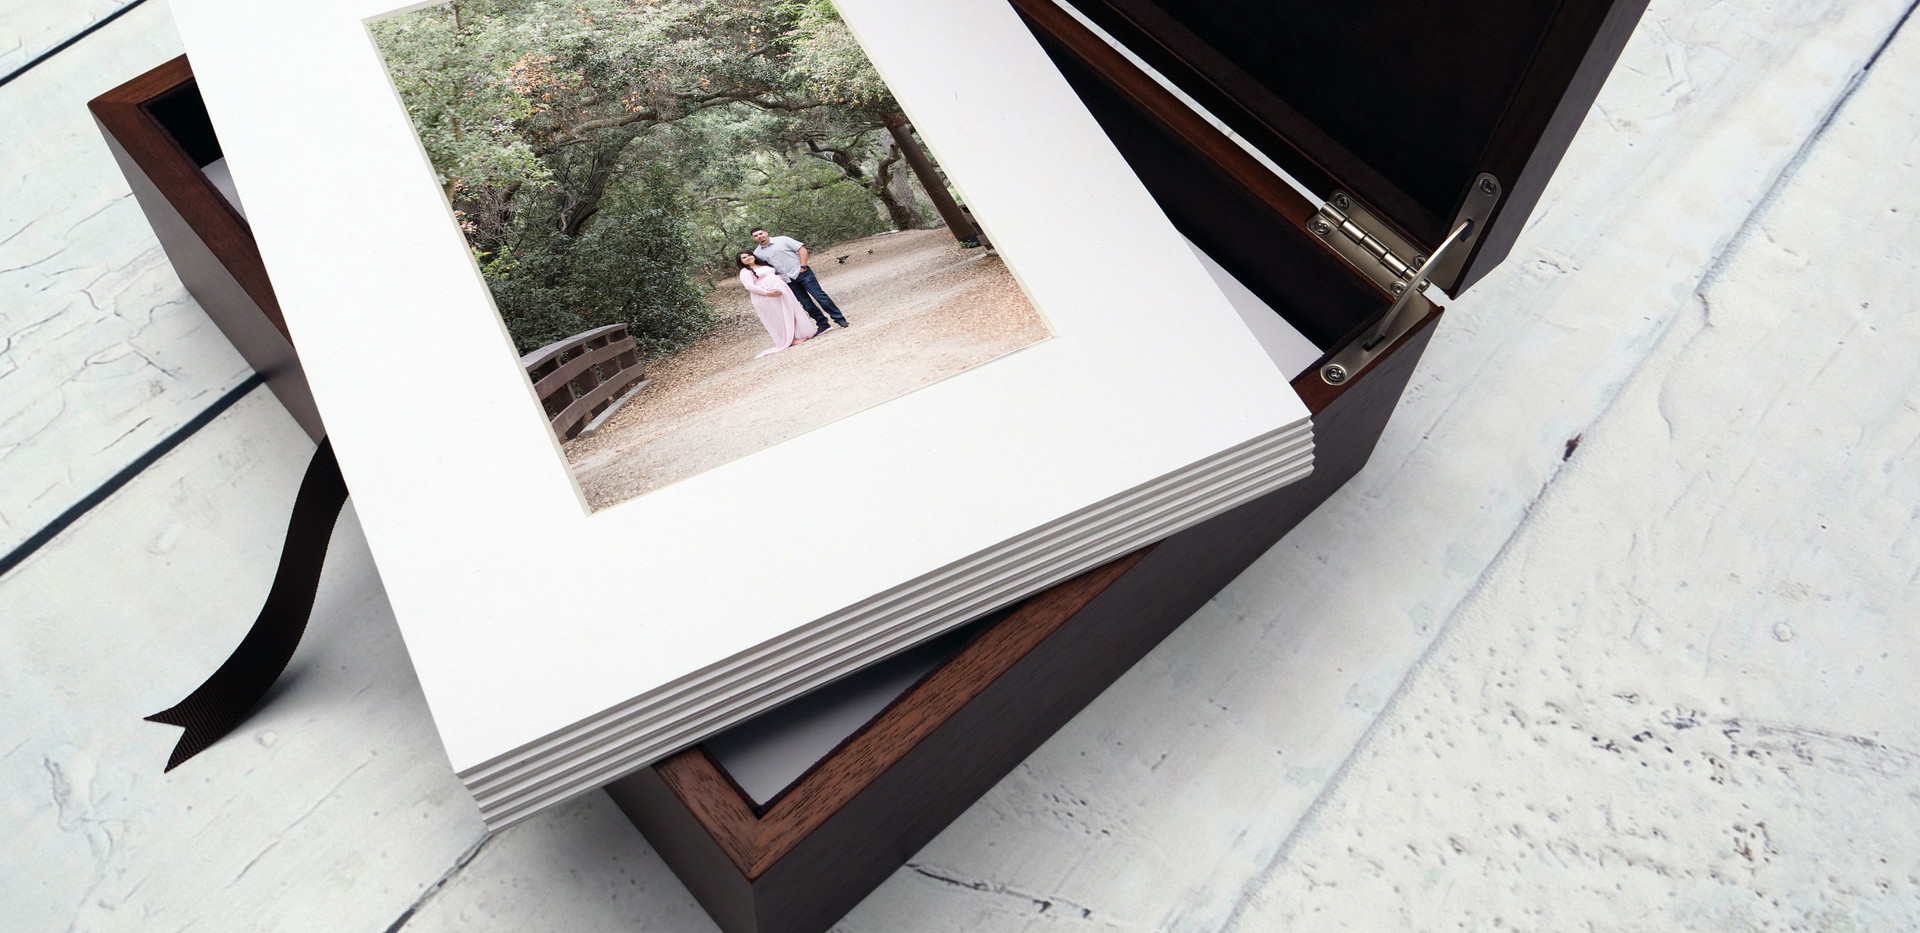 Wood Box w Maternity Image.jpg